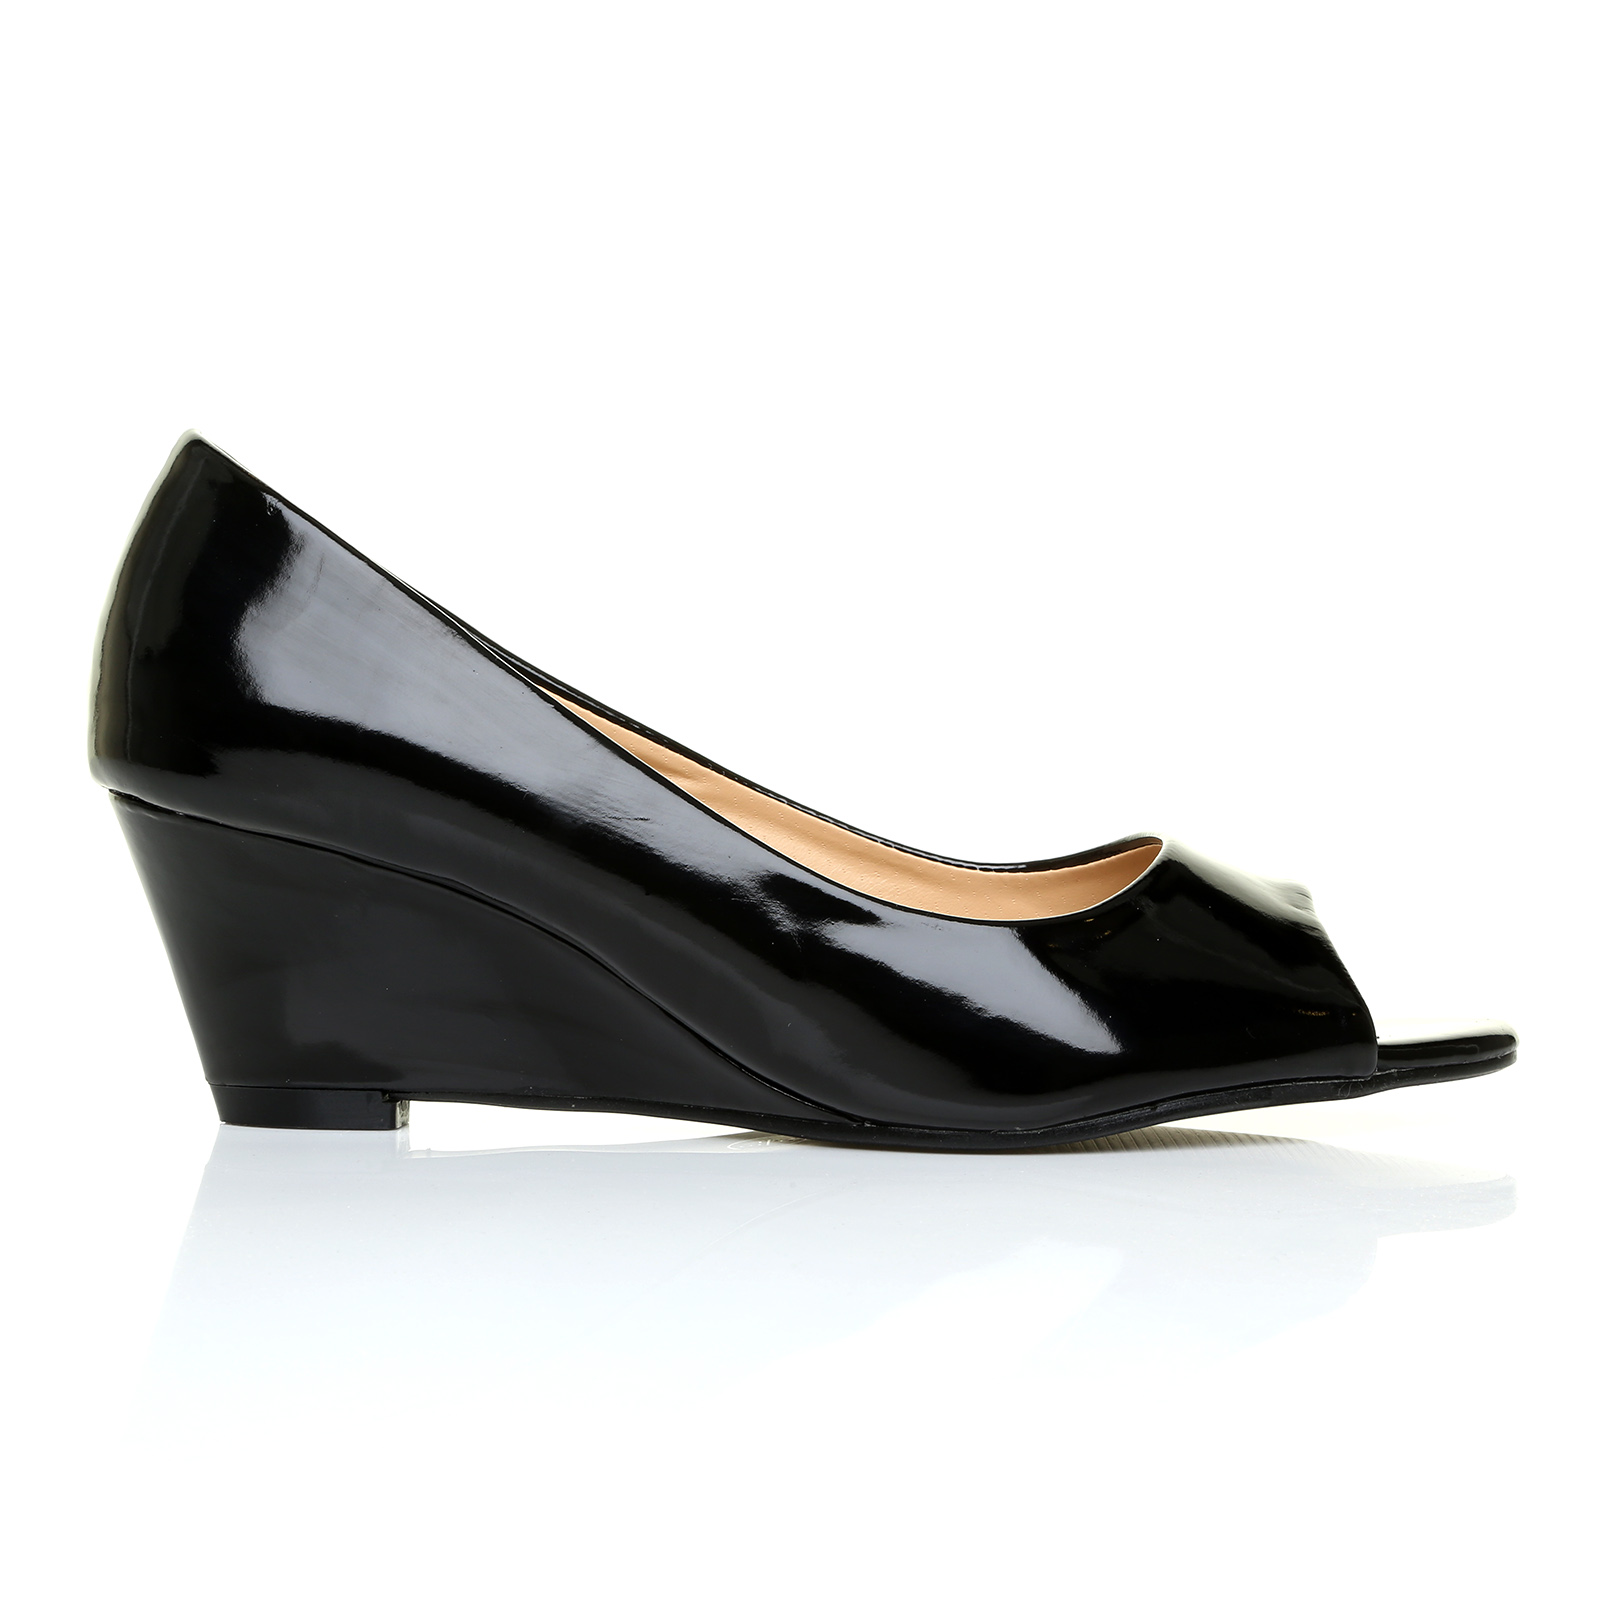 suede patent peep toe low mid heel wedge womens casual